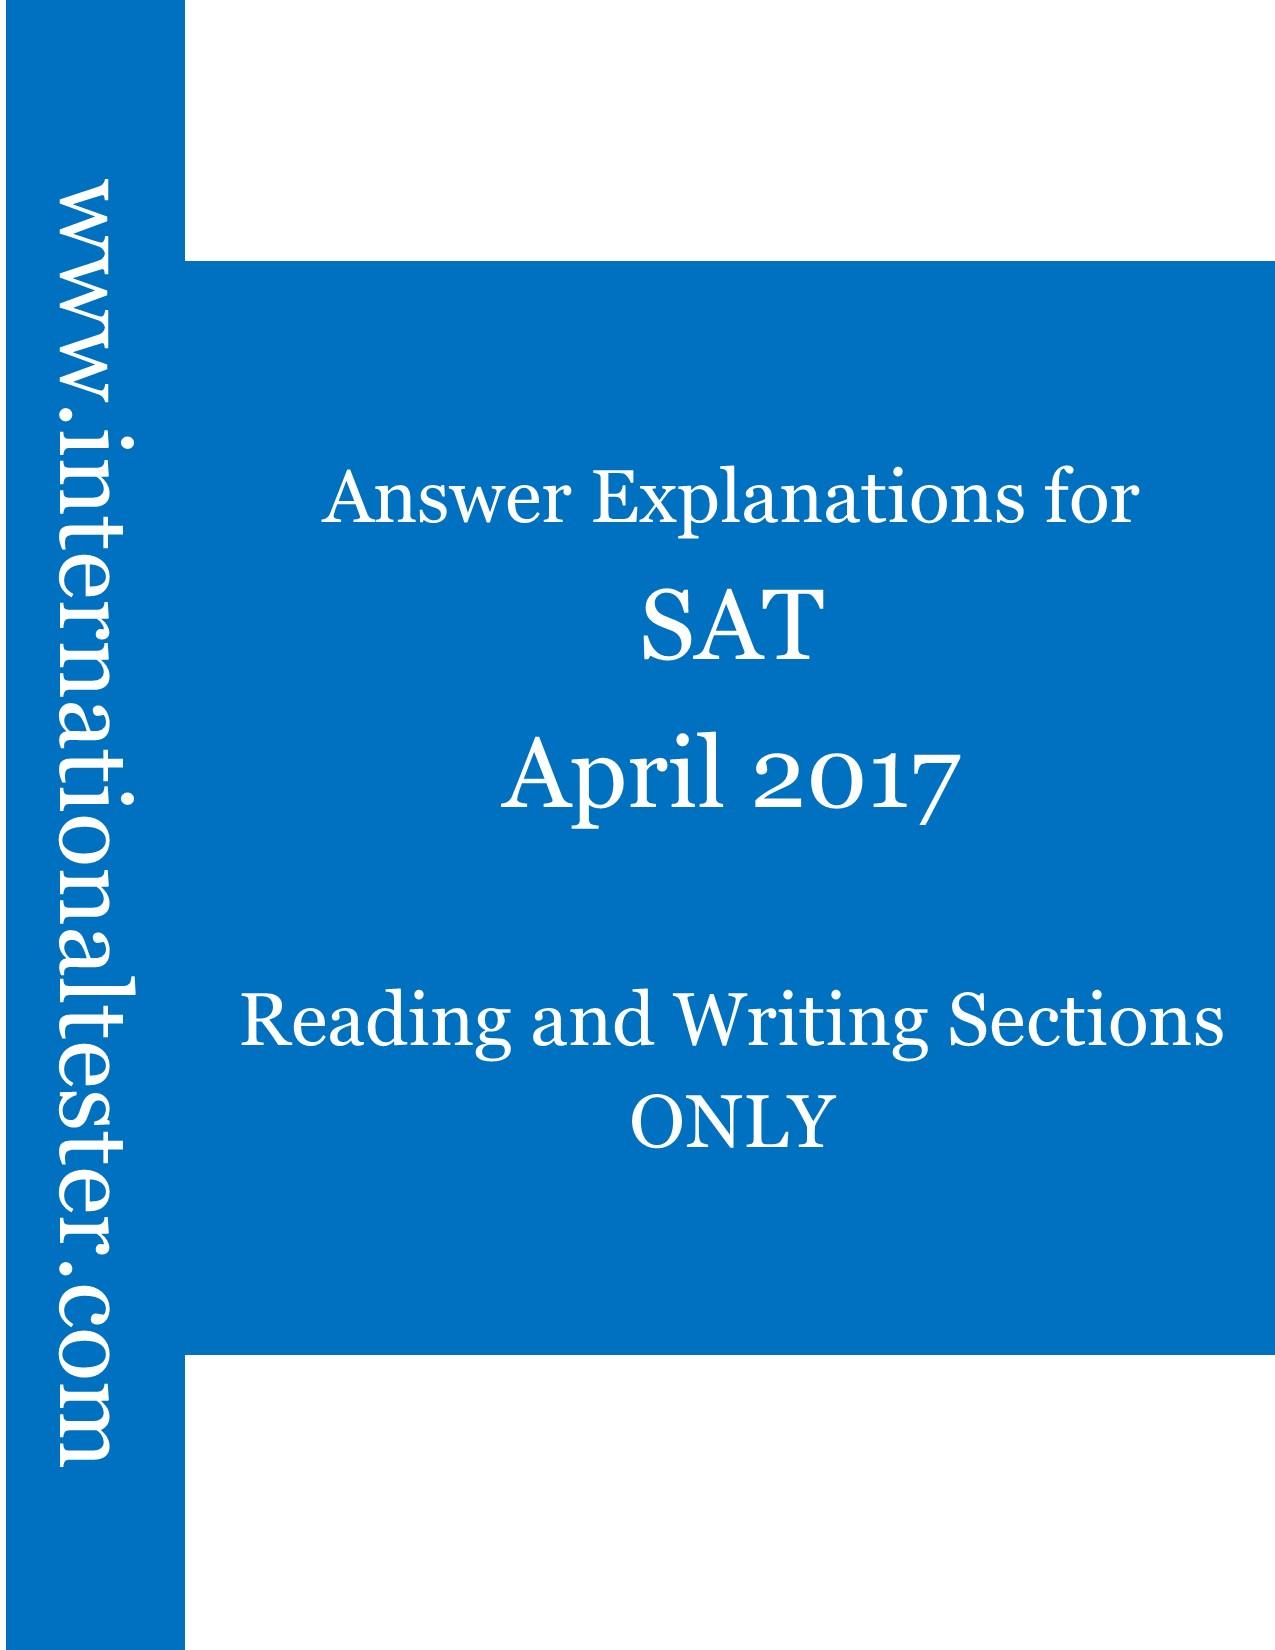 QAS April 2017 Answer Explanations | internationaltester